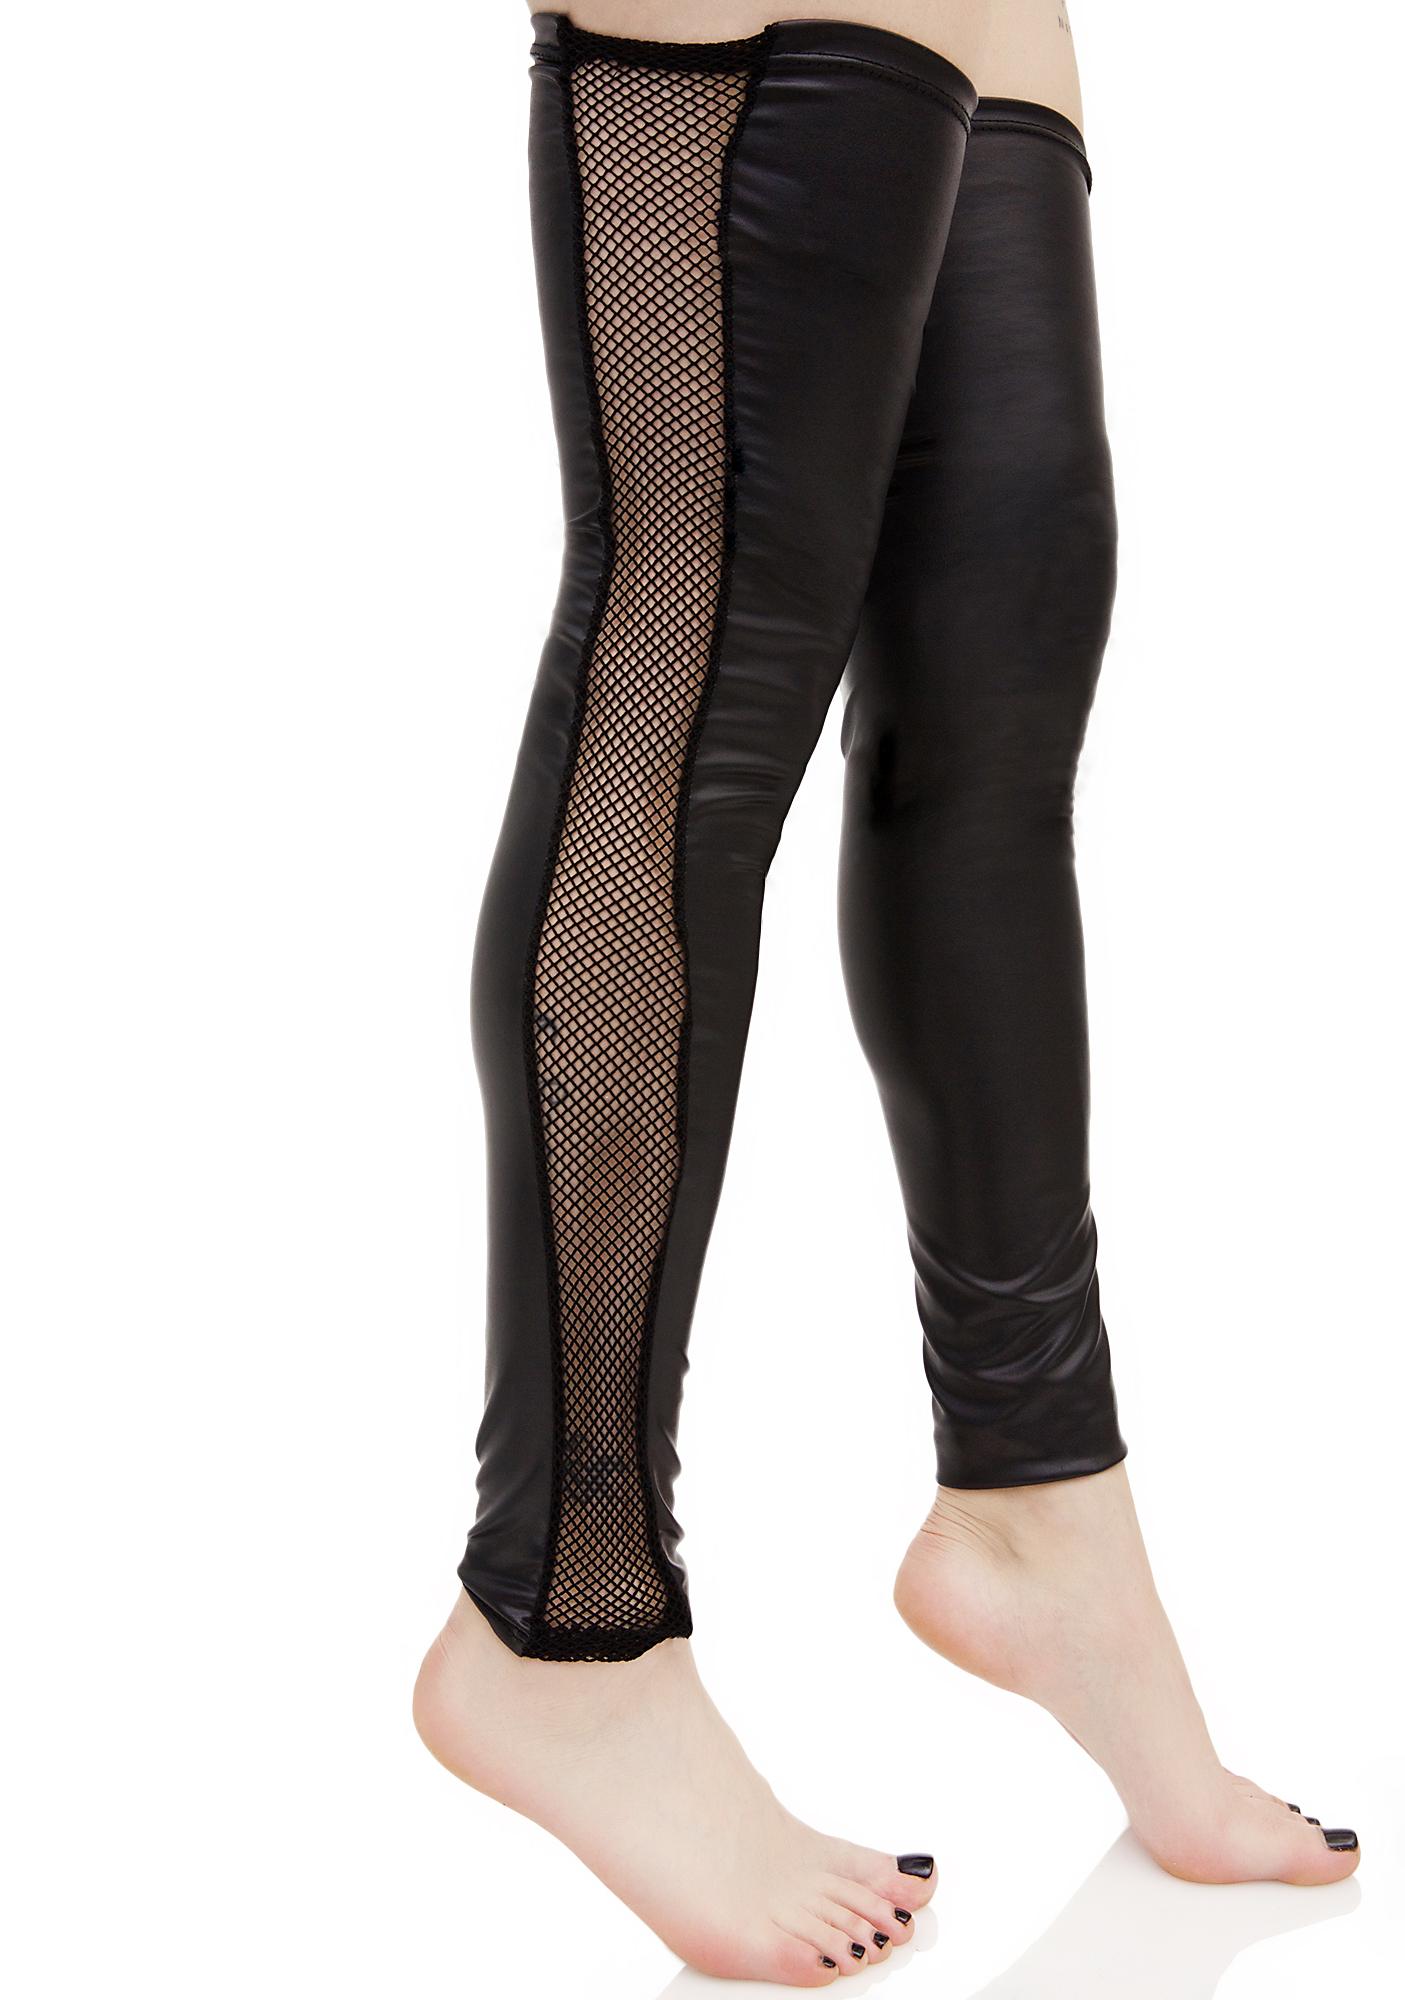 Spandex Fishnet Leg Warmers